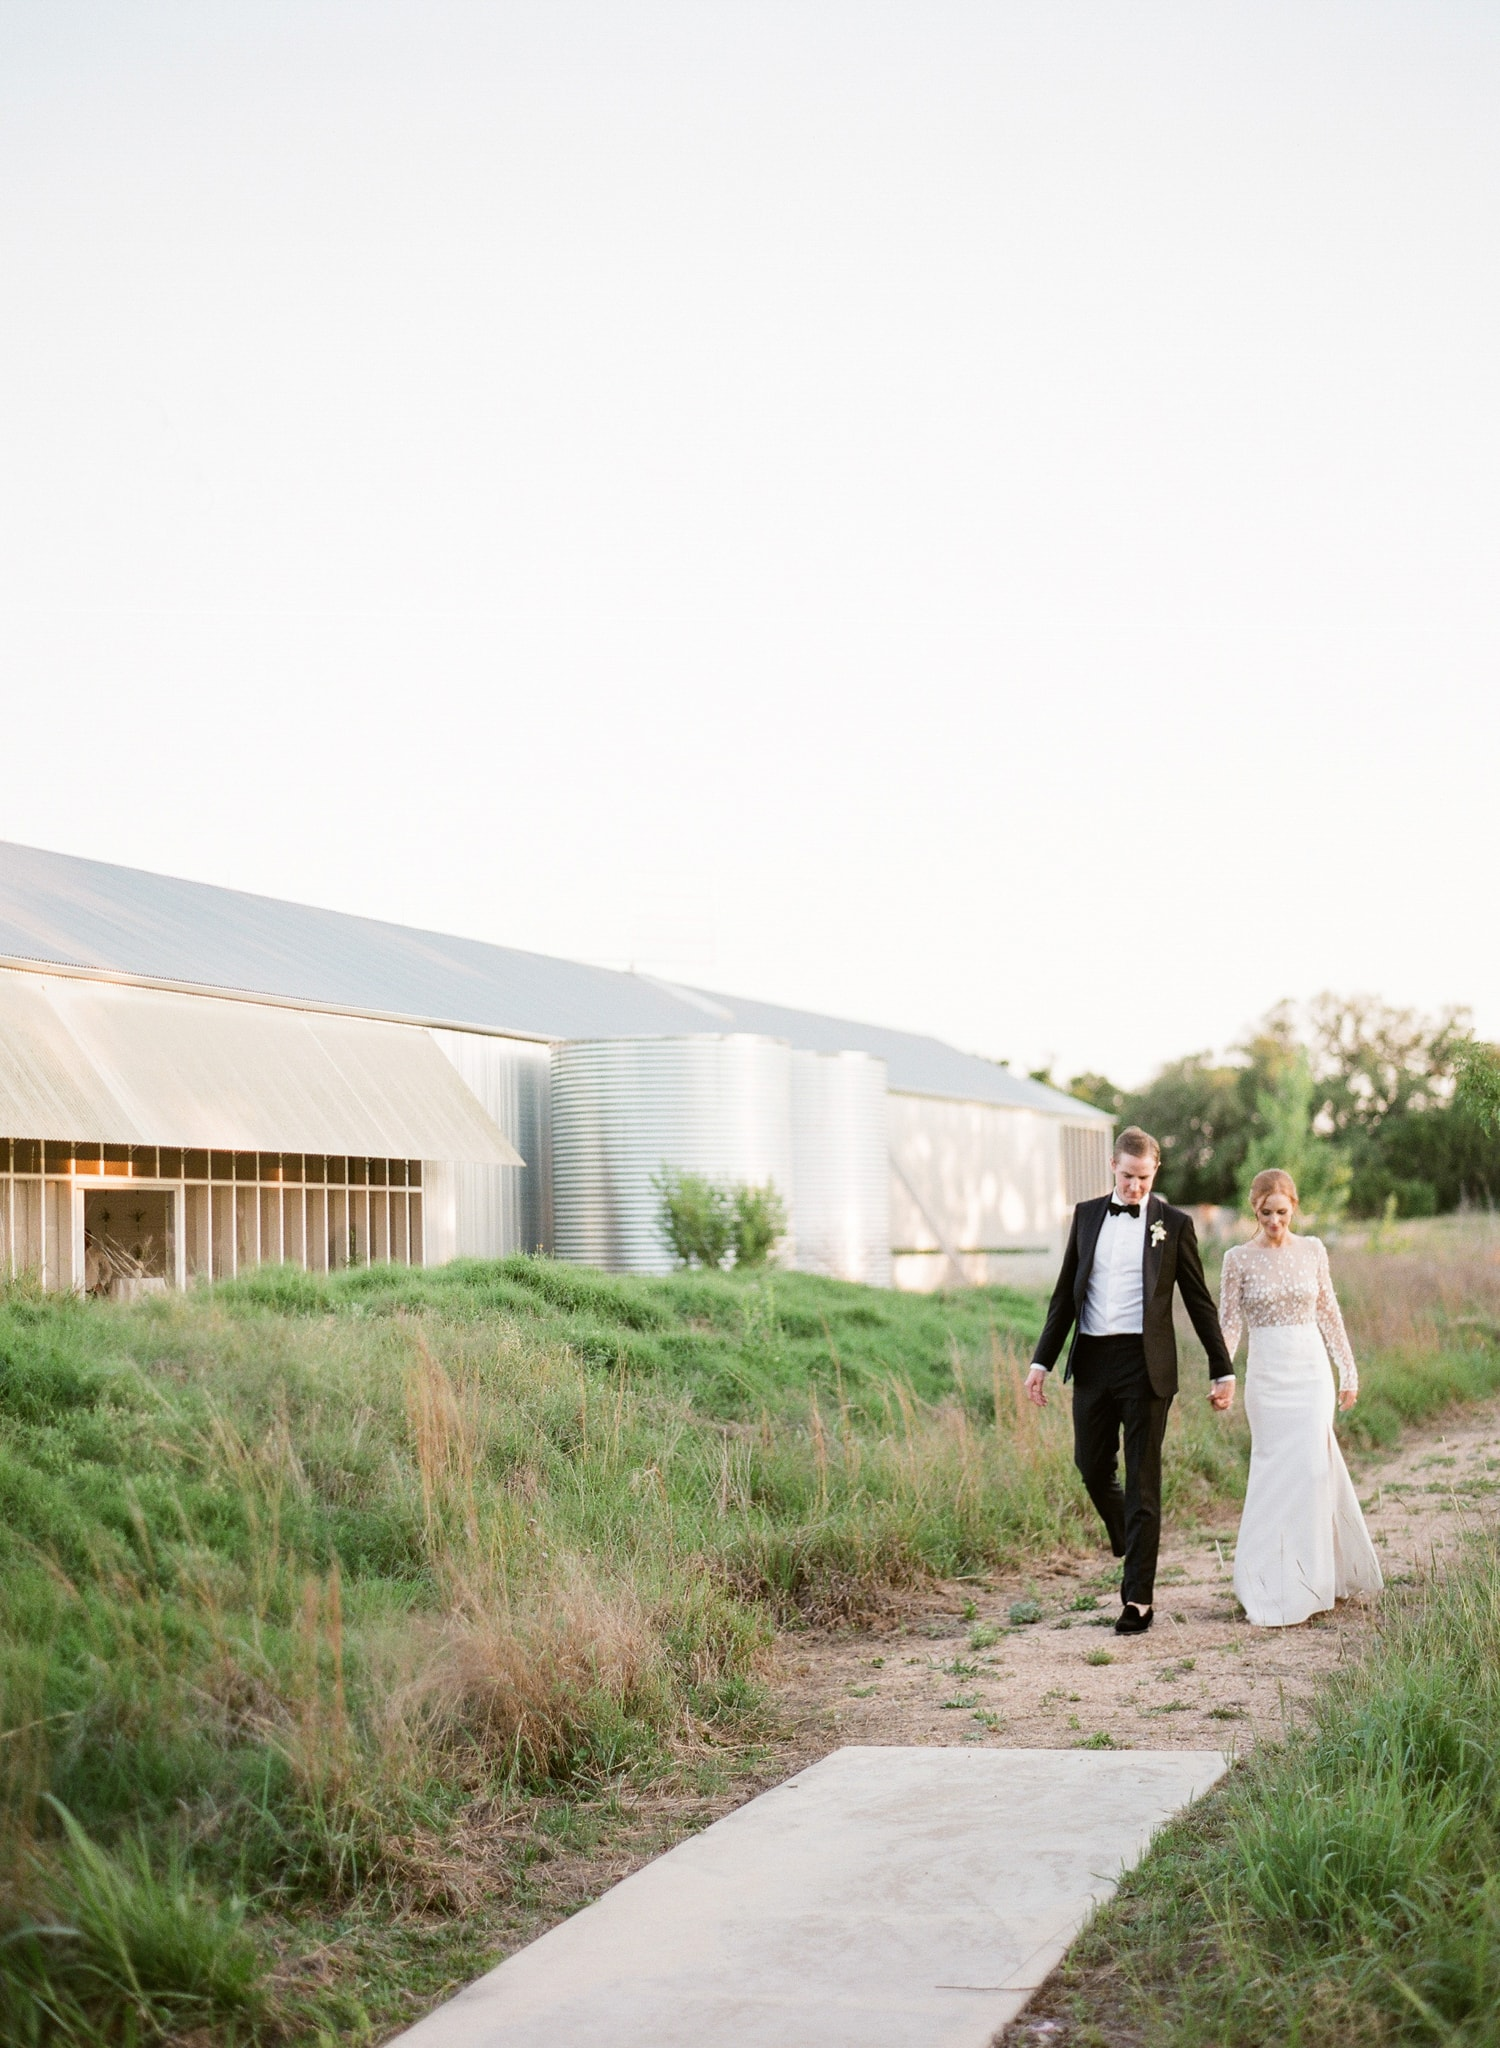 prospect-house-wedding-20.jpg